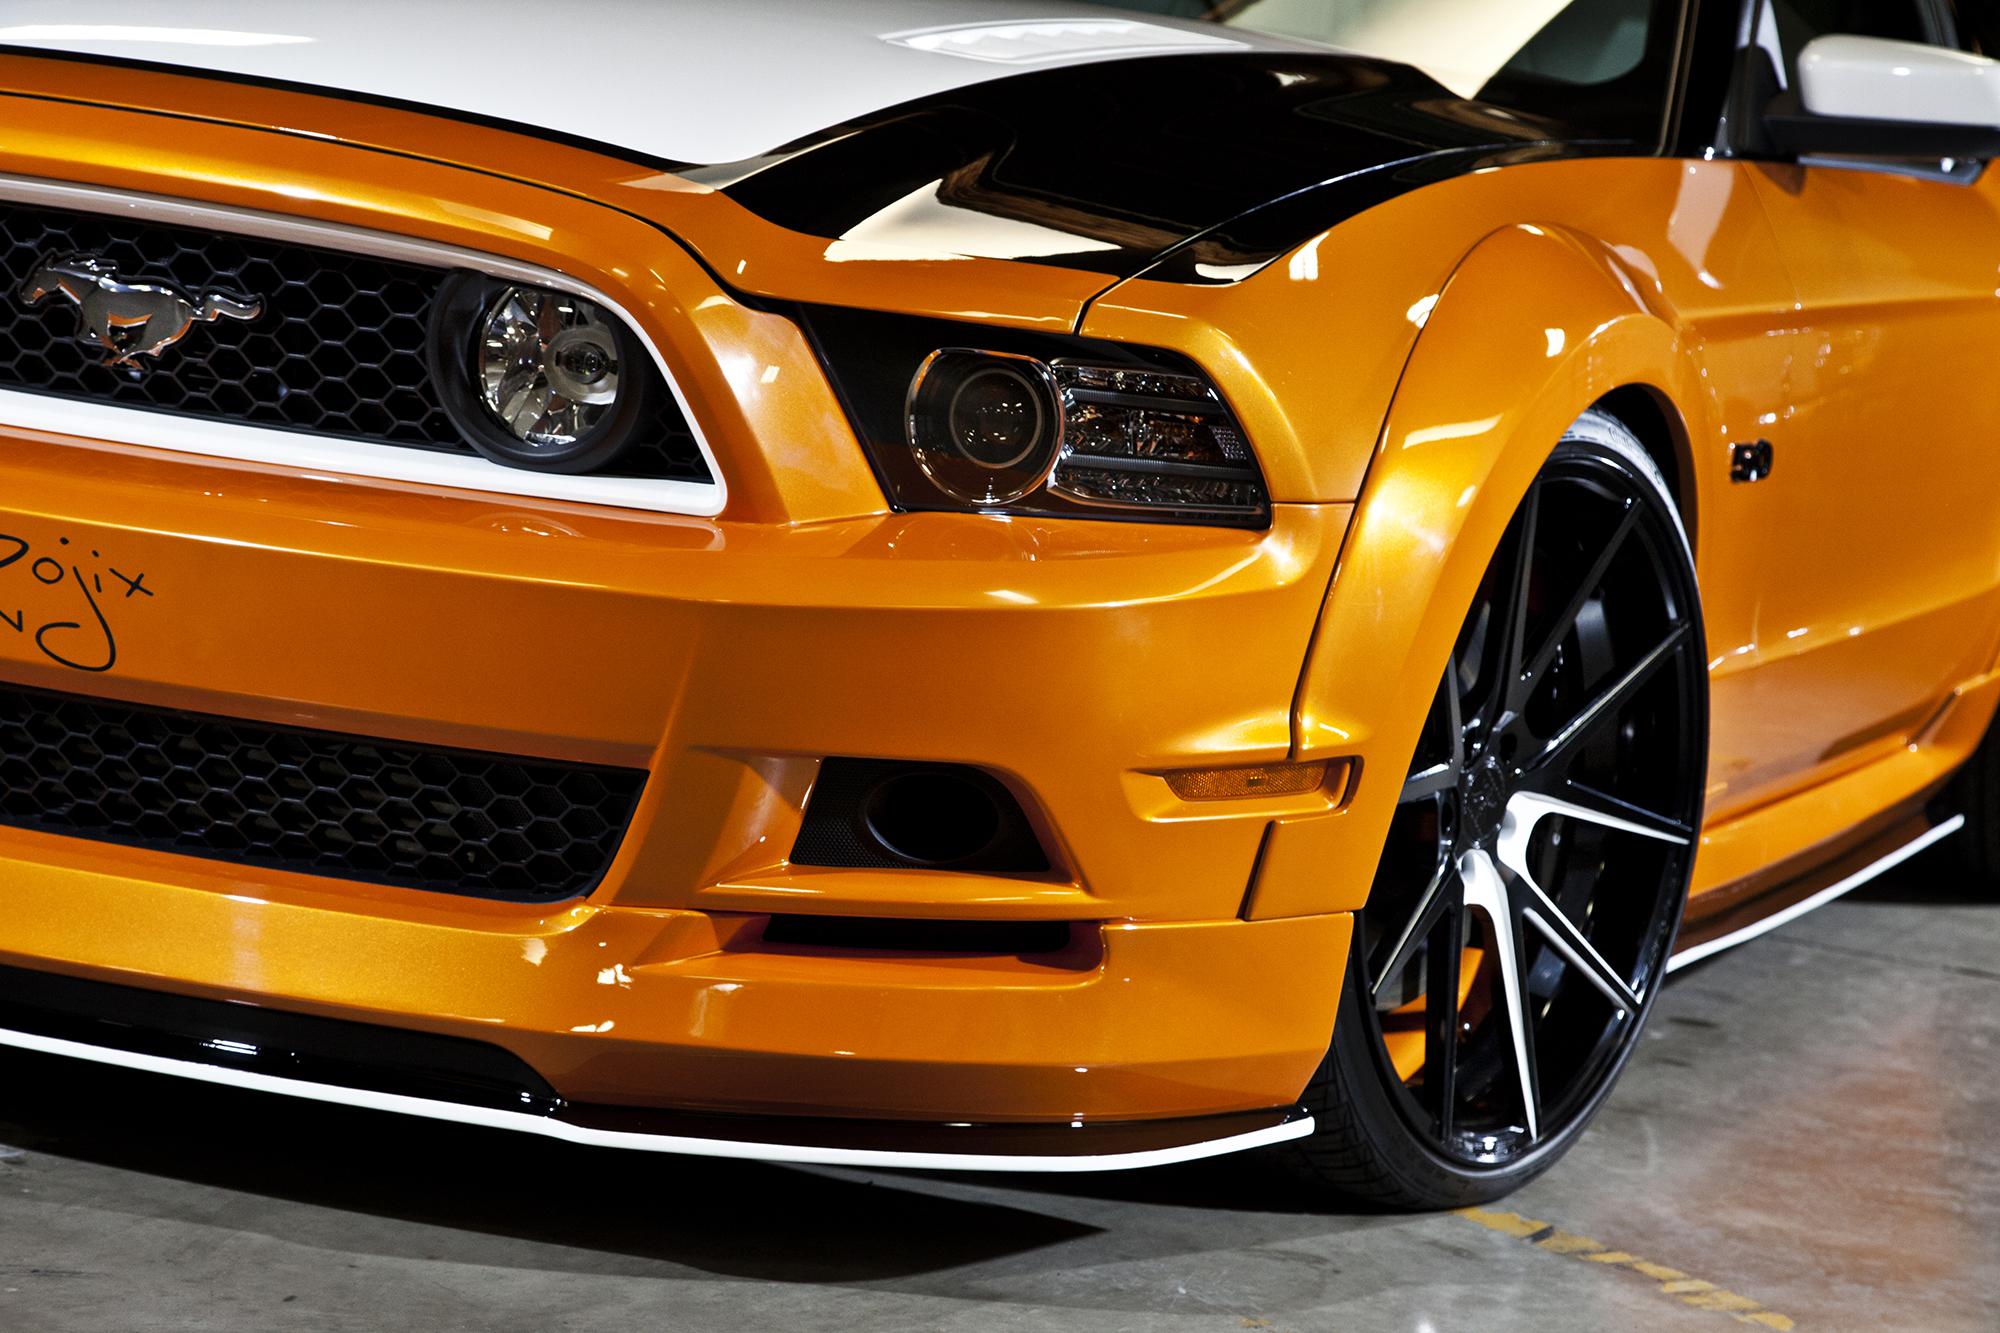 Bojix Mustang GT front corner detail